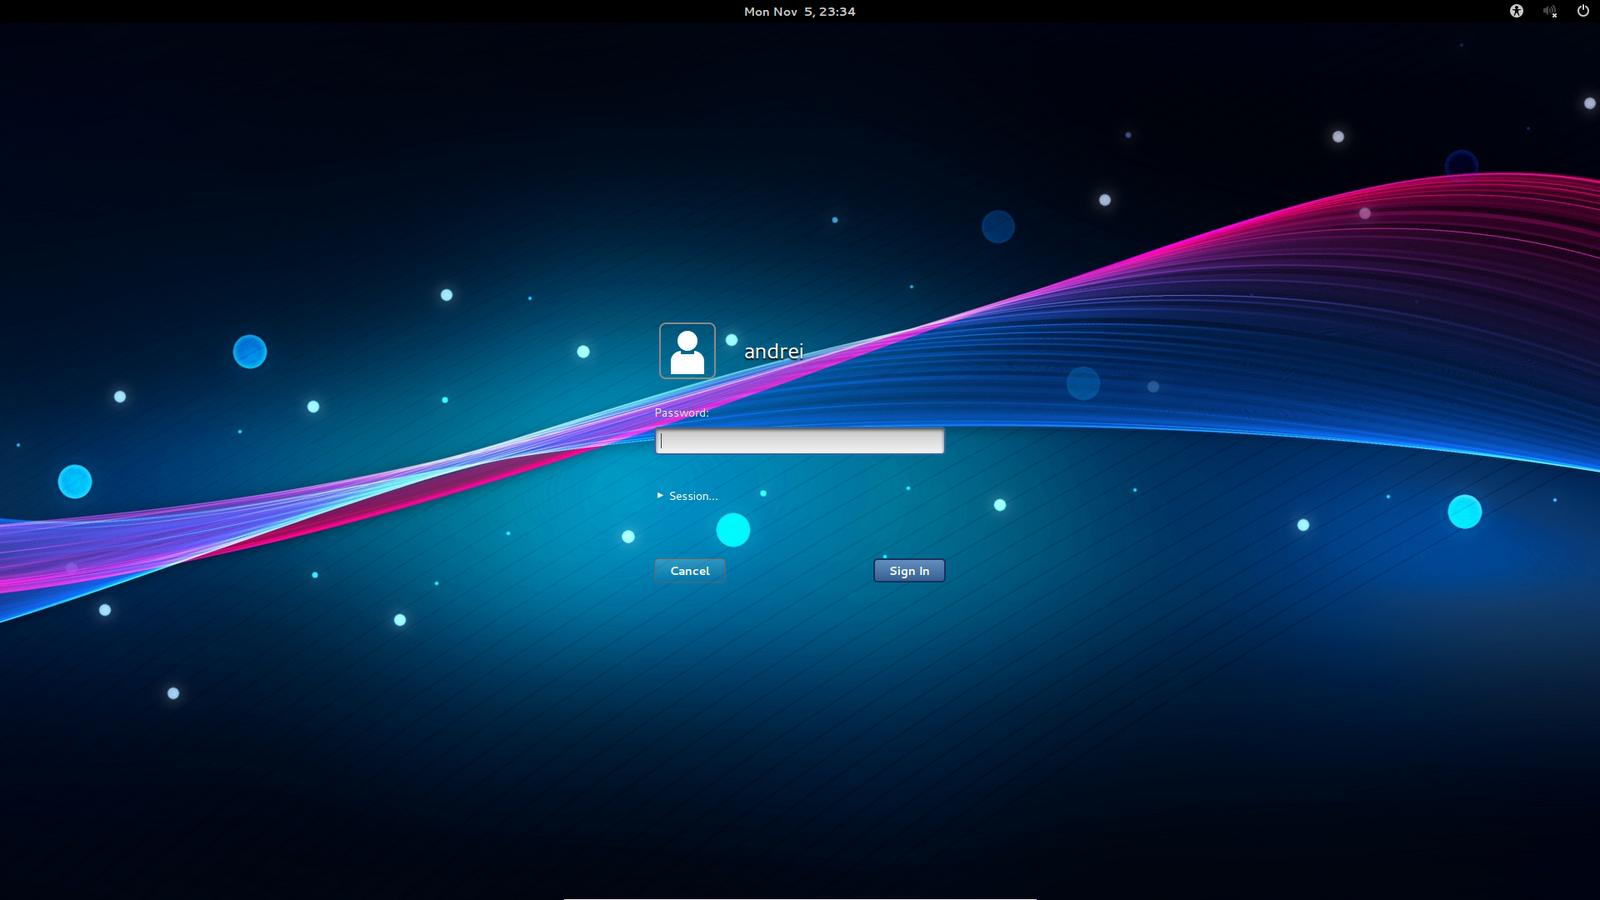 Windows 7 lock screen wallpaper